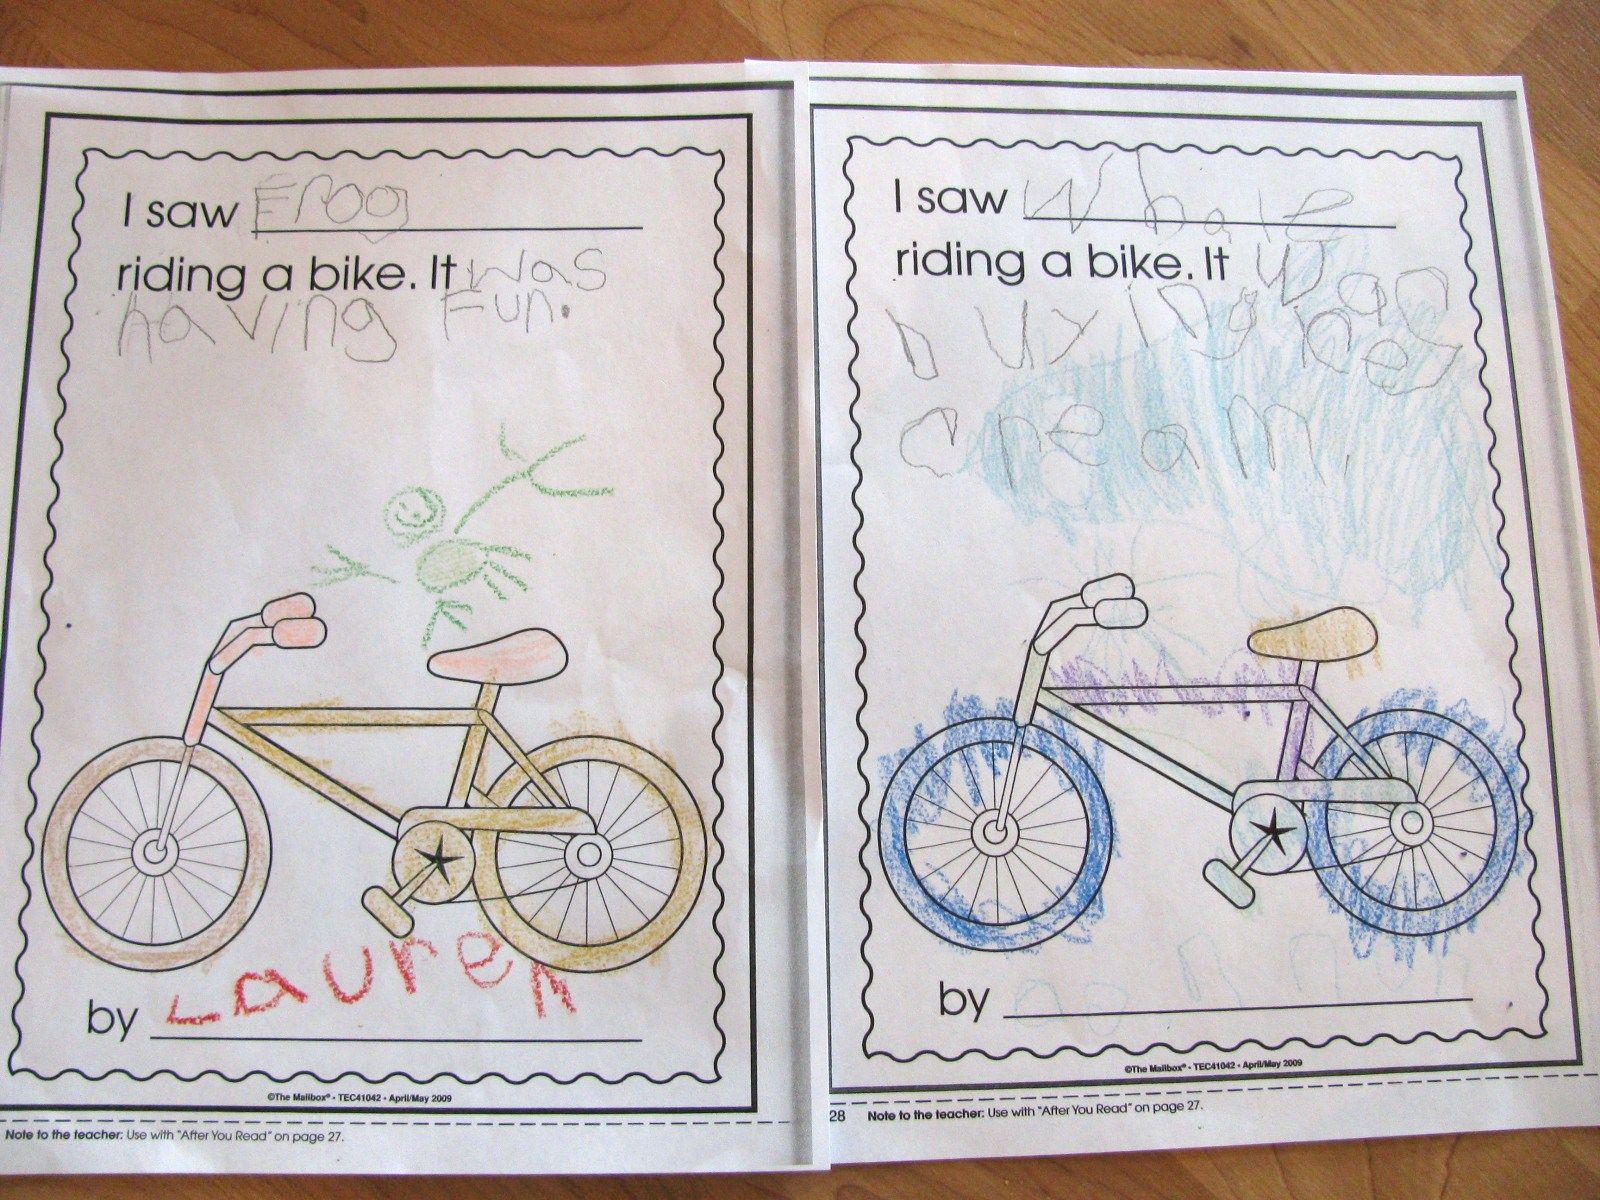 1 Bp Blogspot Com Dkhxaafyaoq S9xwtrnz0wi Aaaaaaaaapg W6euk5g3ngq S1600 Duckonabike 005 Jpg Duck On A Bike Preschool Activities Bike